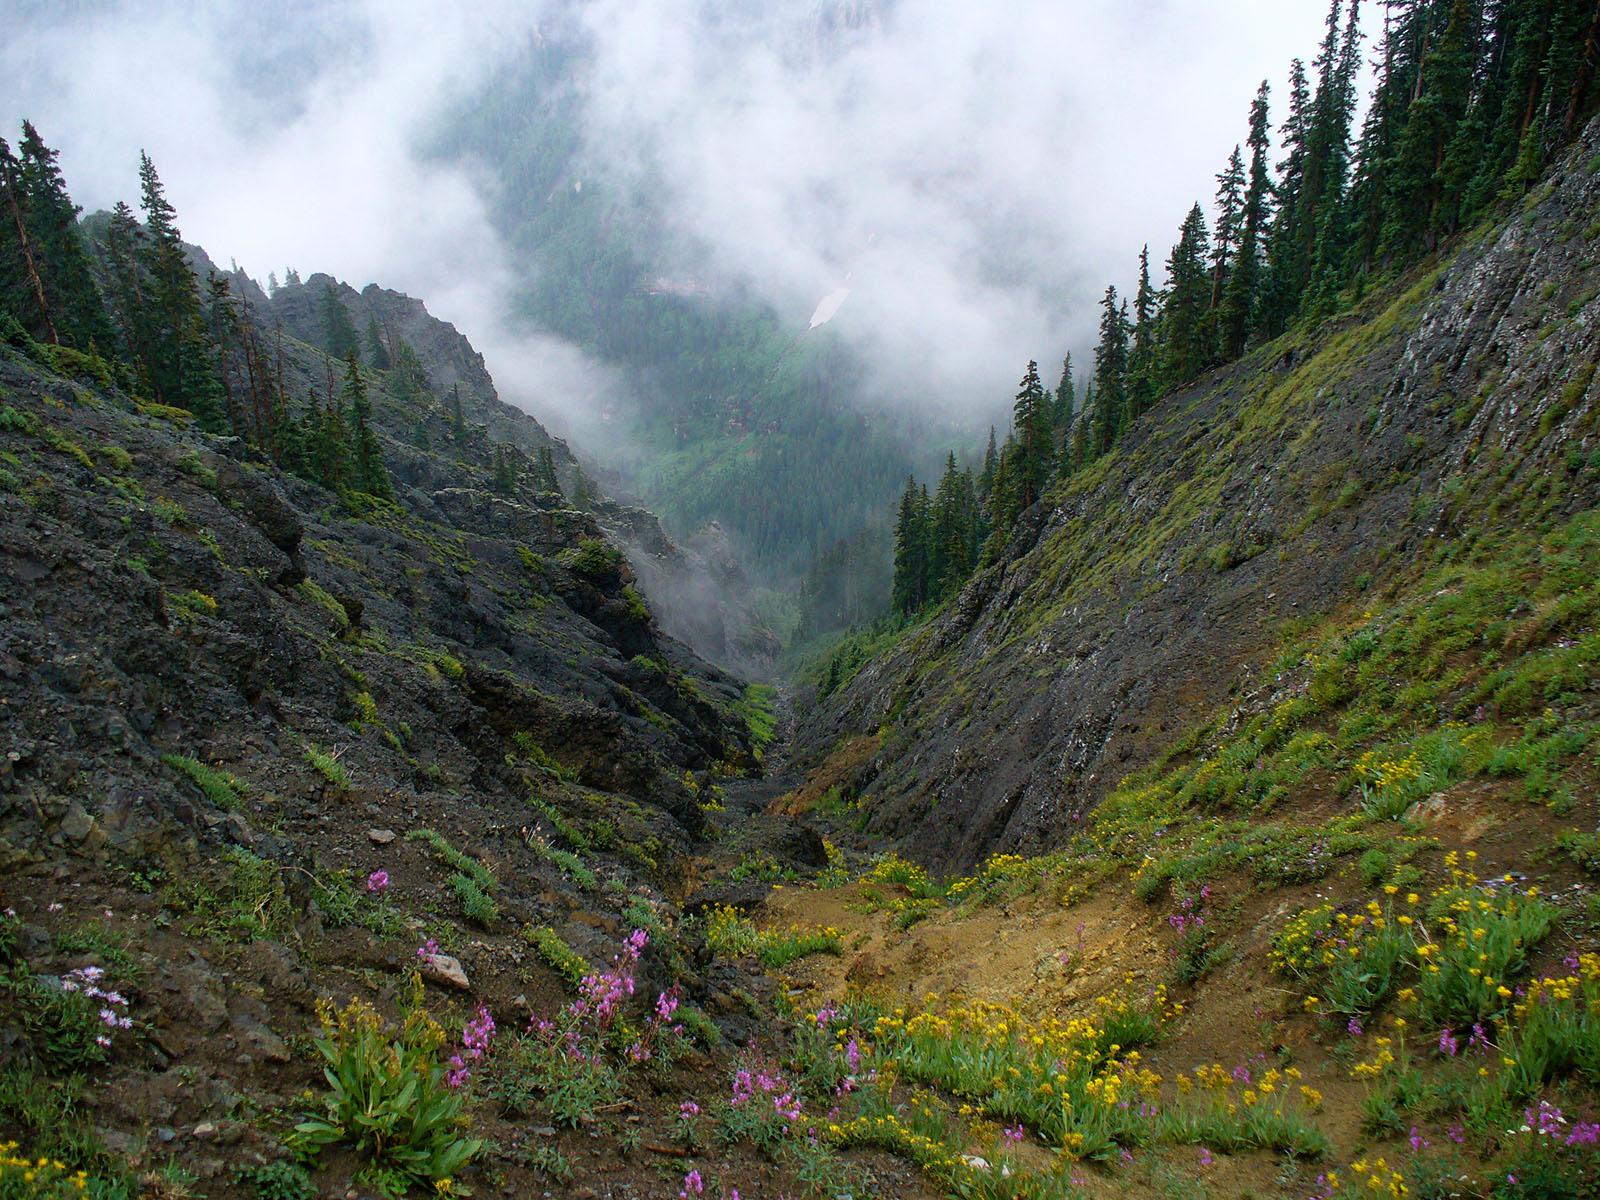 Weathered Bedrock: Key to Advanced Life on Earth